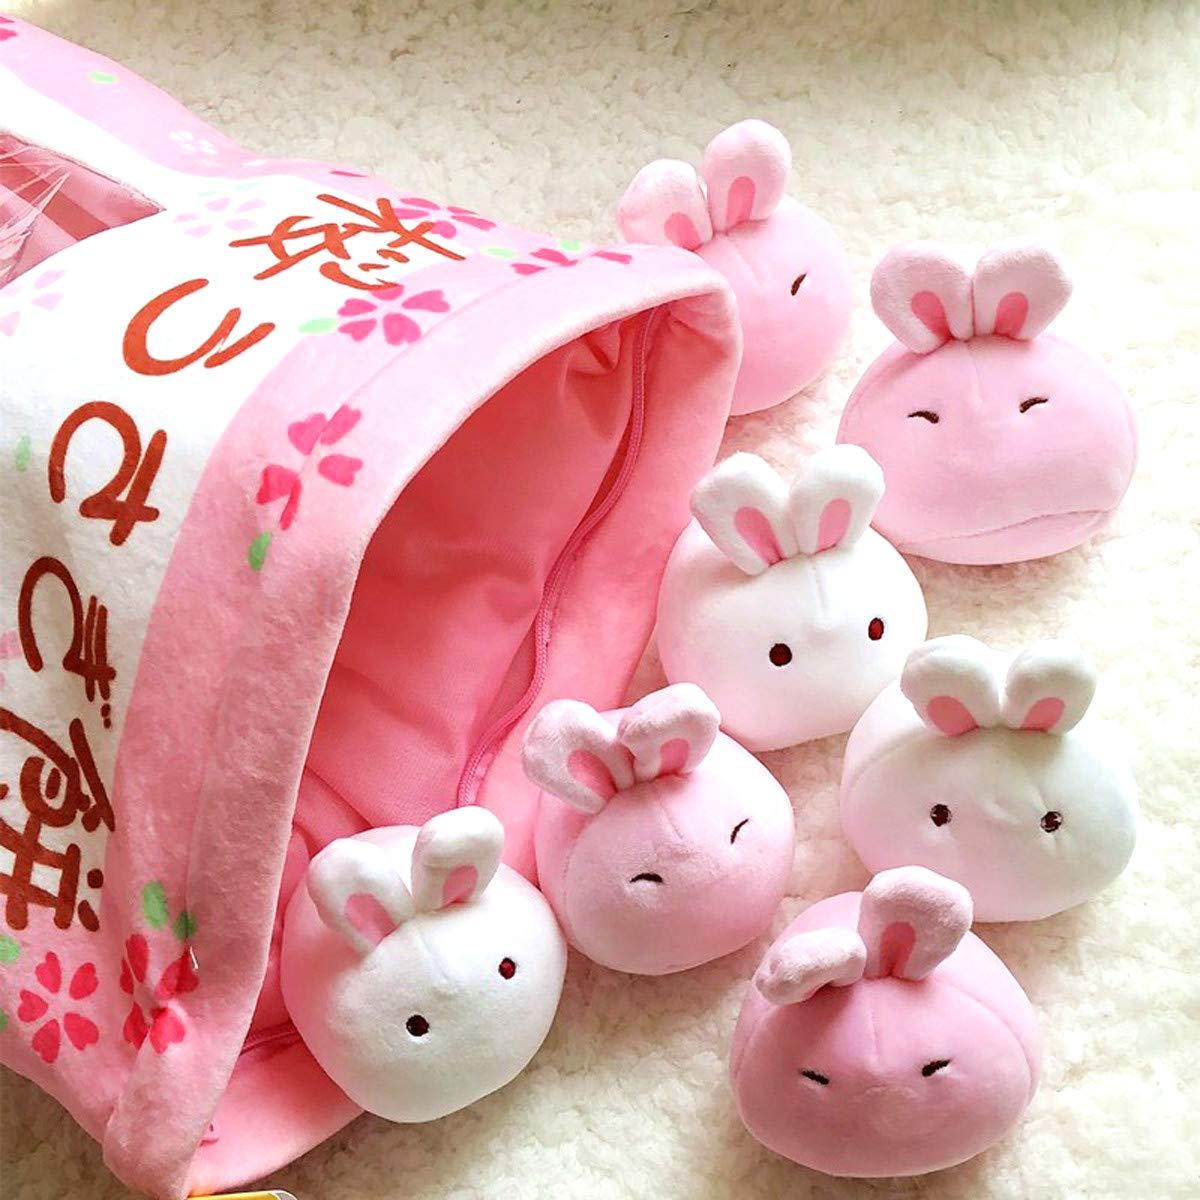 Nenalayo Cute Throw Pillow Stuffed Animal Toys Removable Fluffy Bunnies Creative Gifts for Teens Girls Kids by Nenalayo (Image #3)